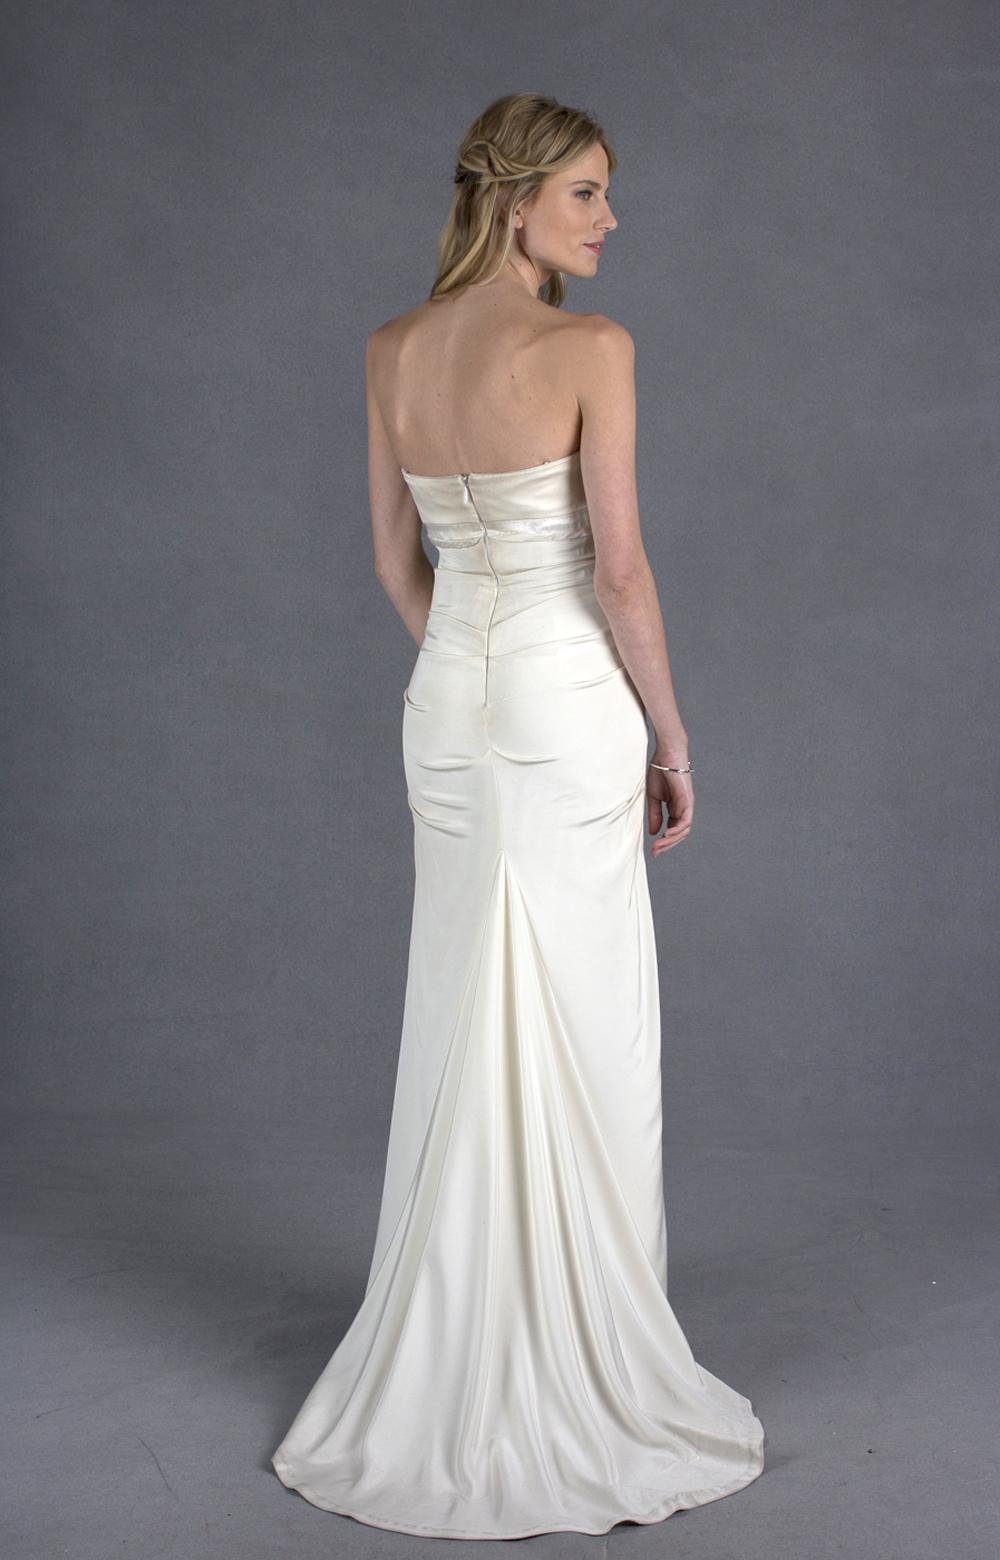 Nicole miller camilla bridal gown in white lyst for Nicole miller strapless wedding dress